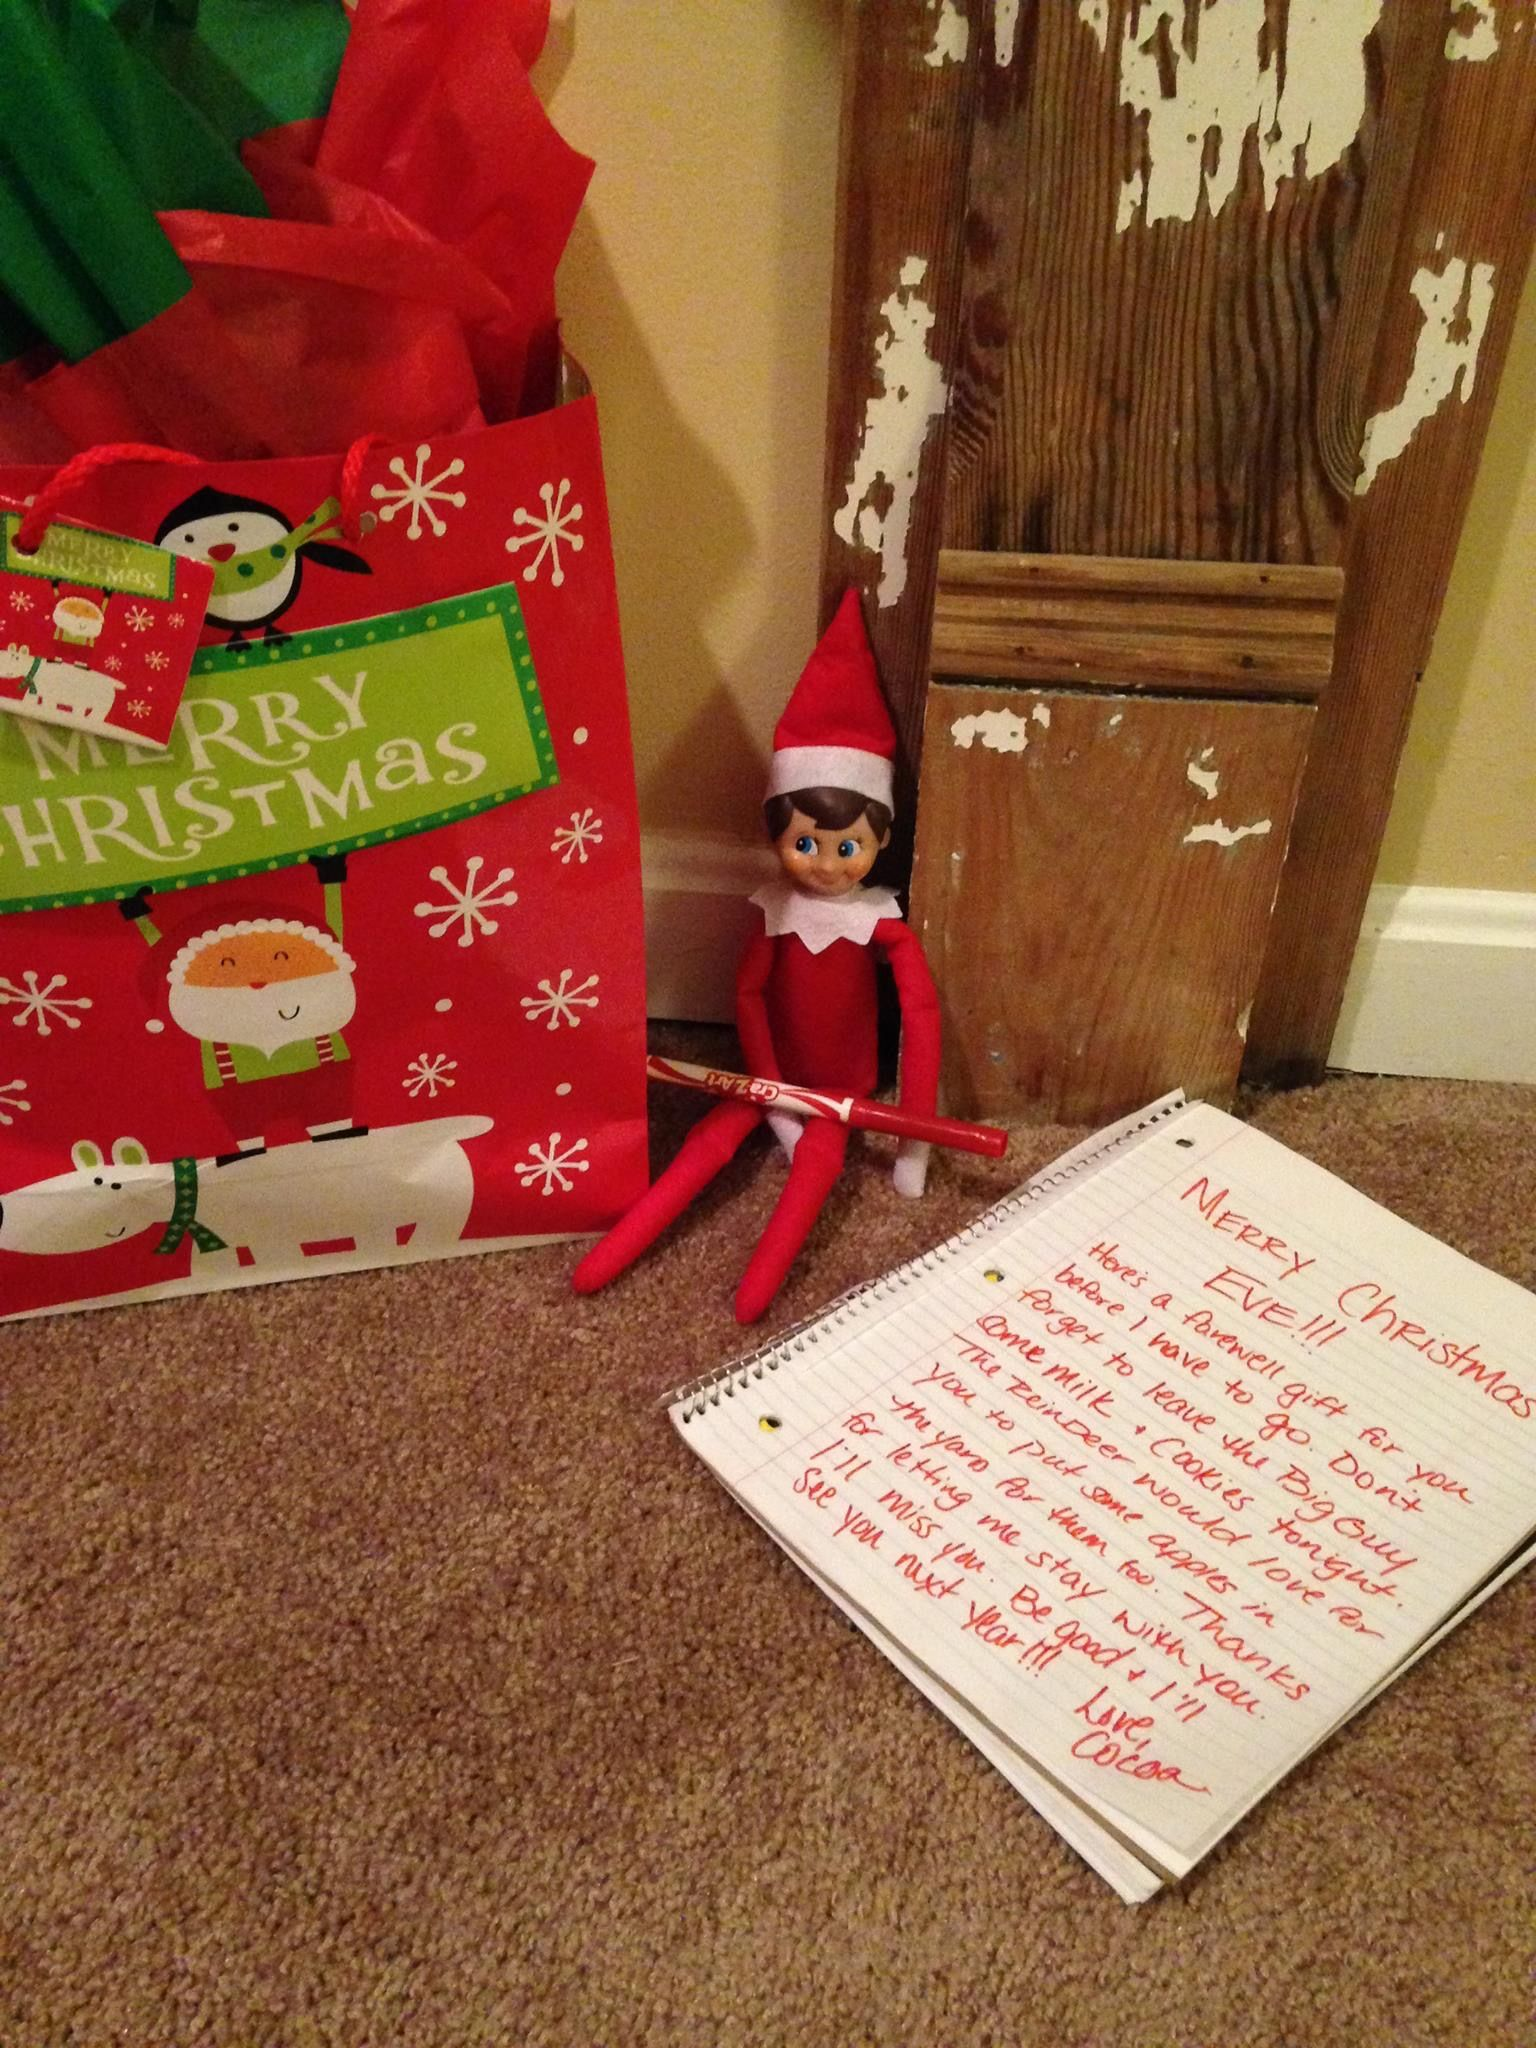 Elf's last night goodbye gift